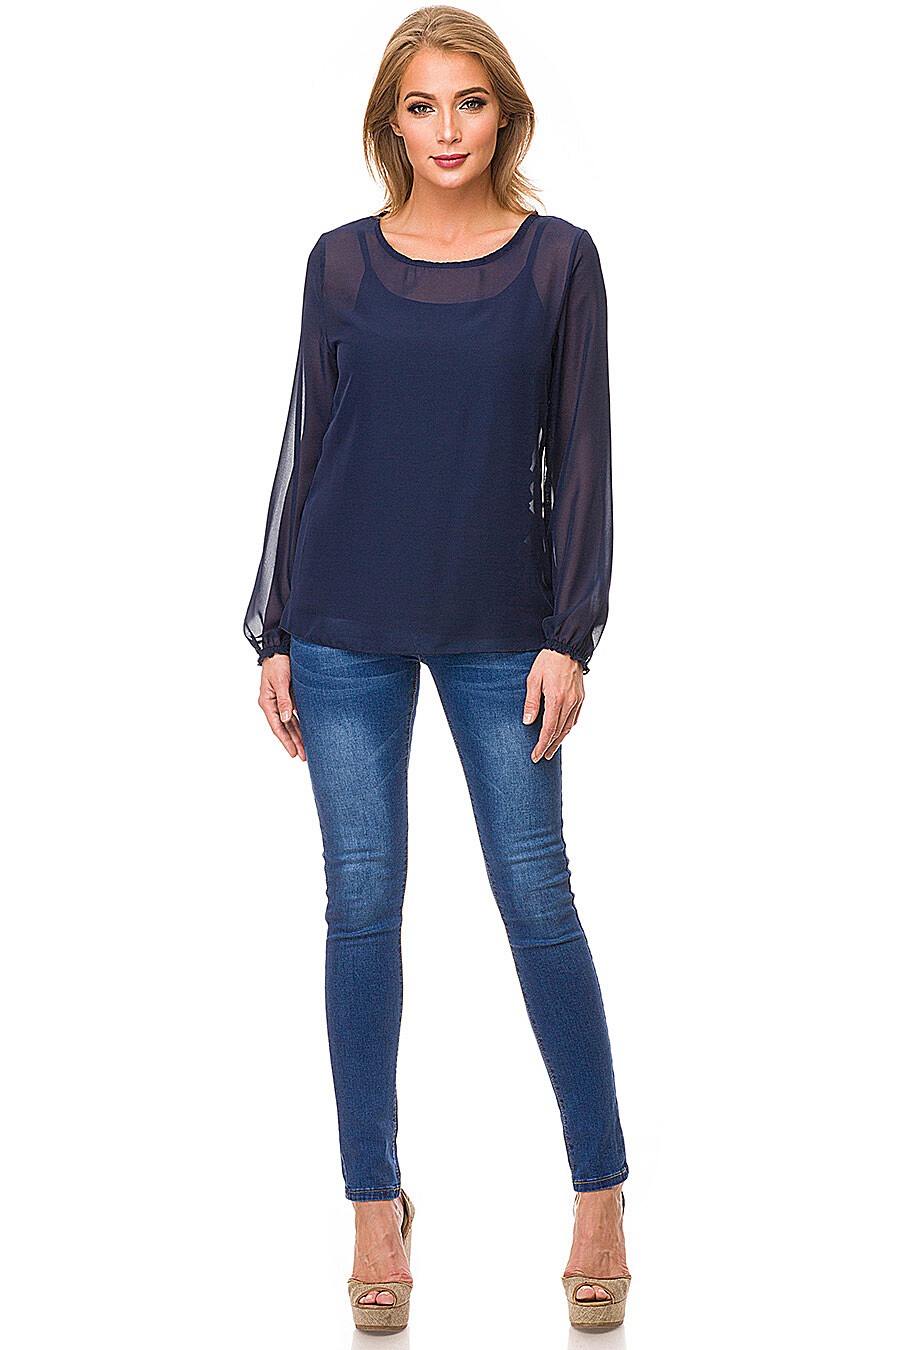 Комплект (Блуза + Топ) #87138